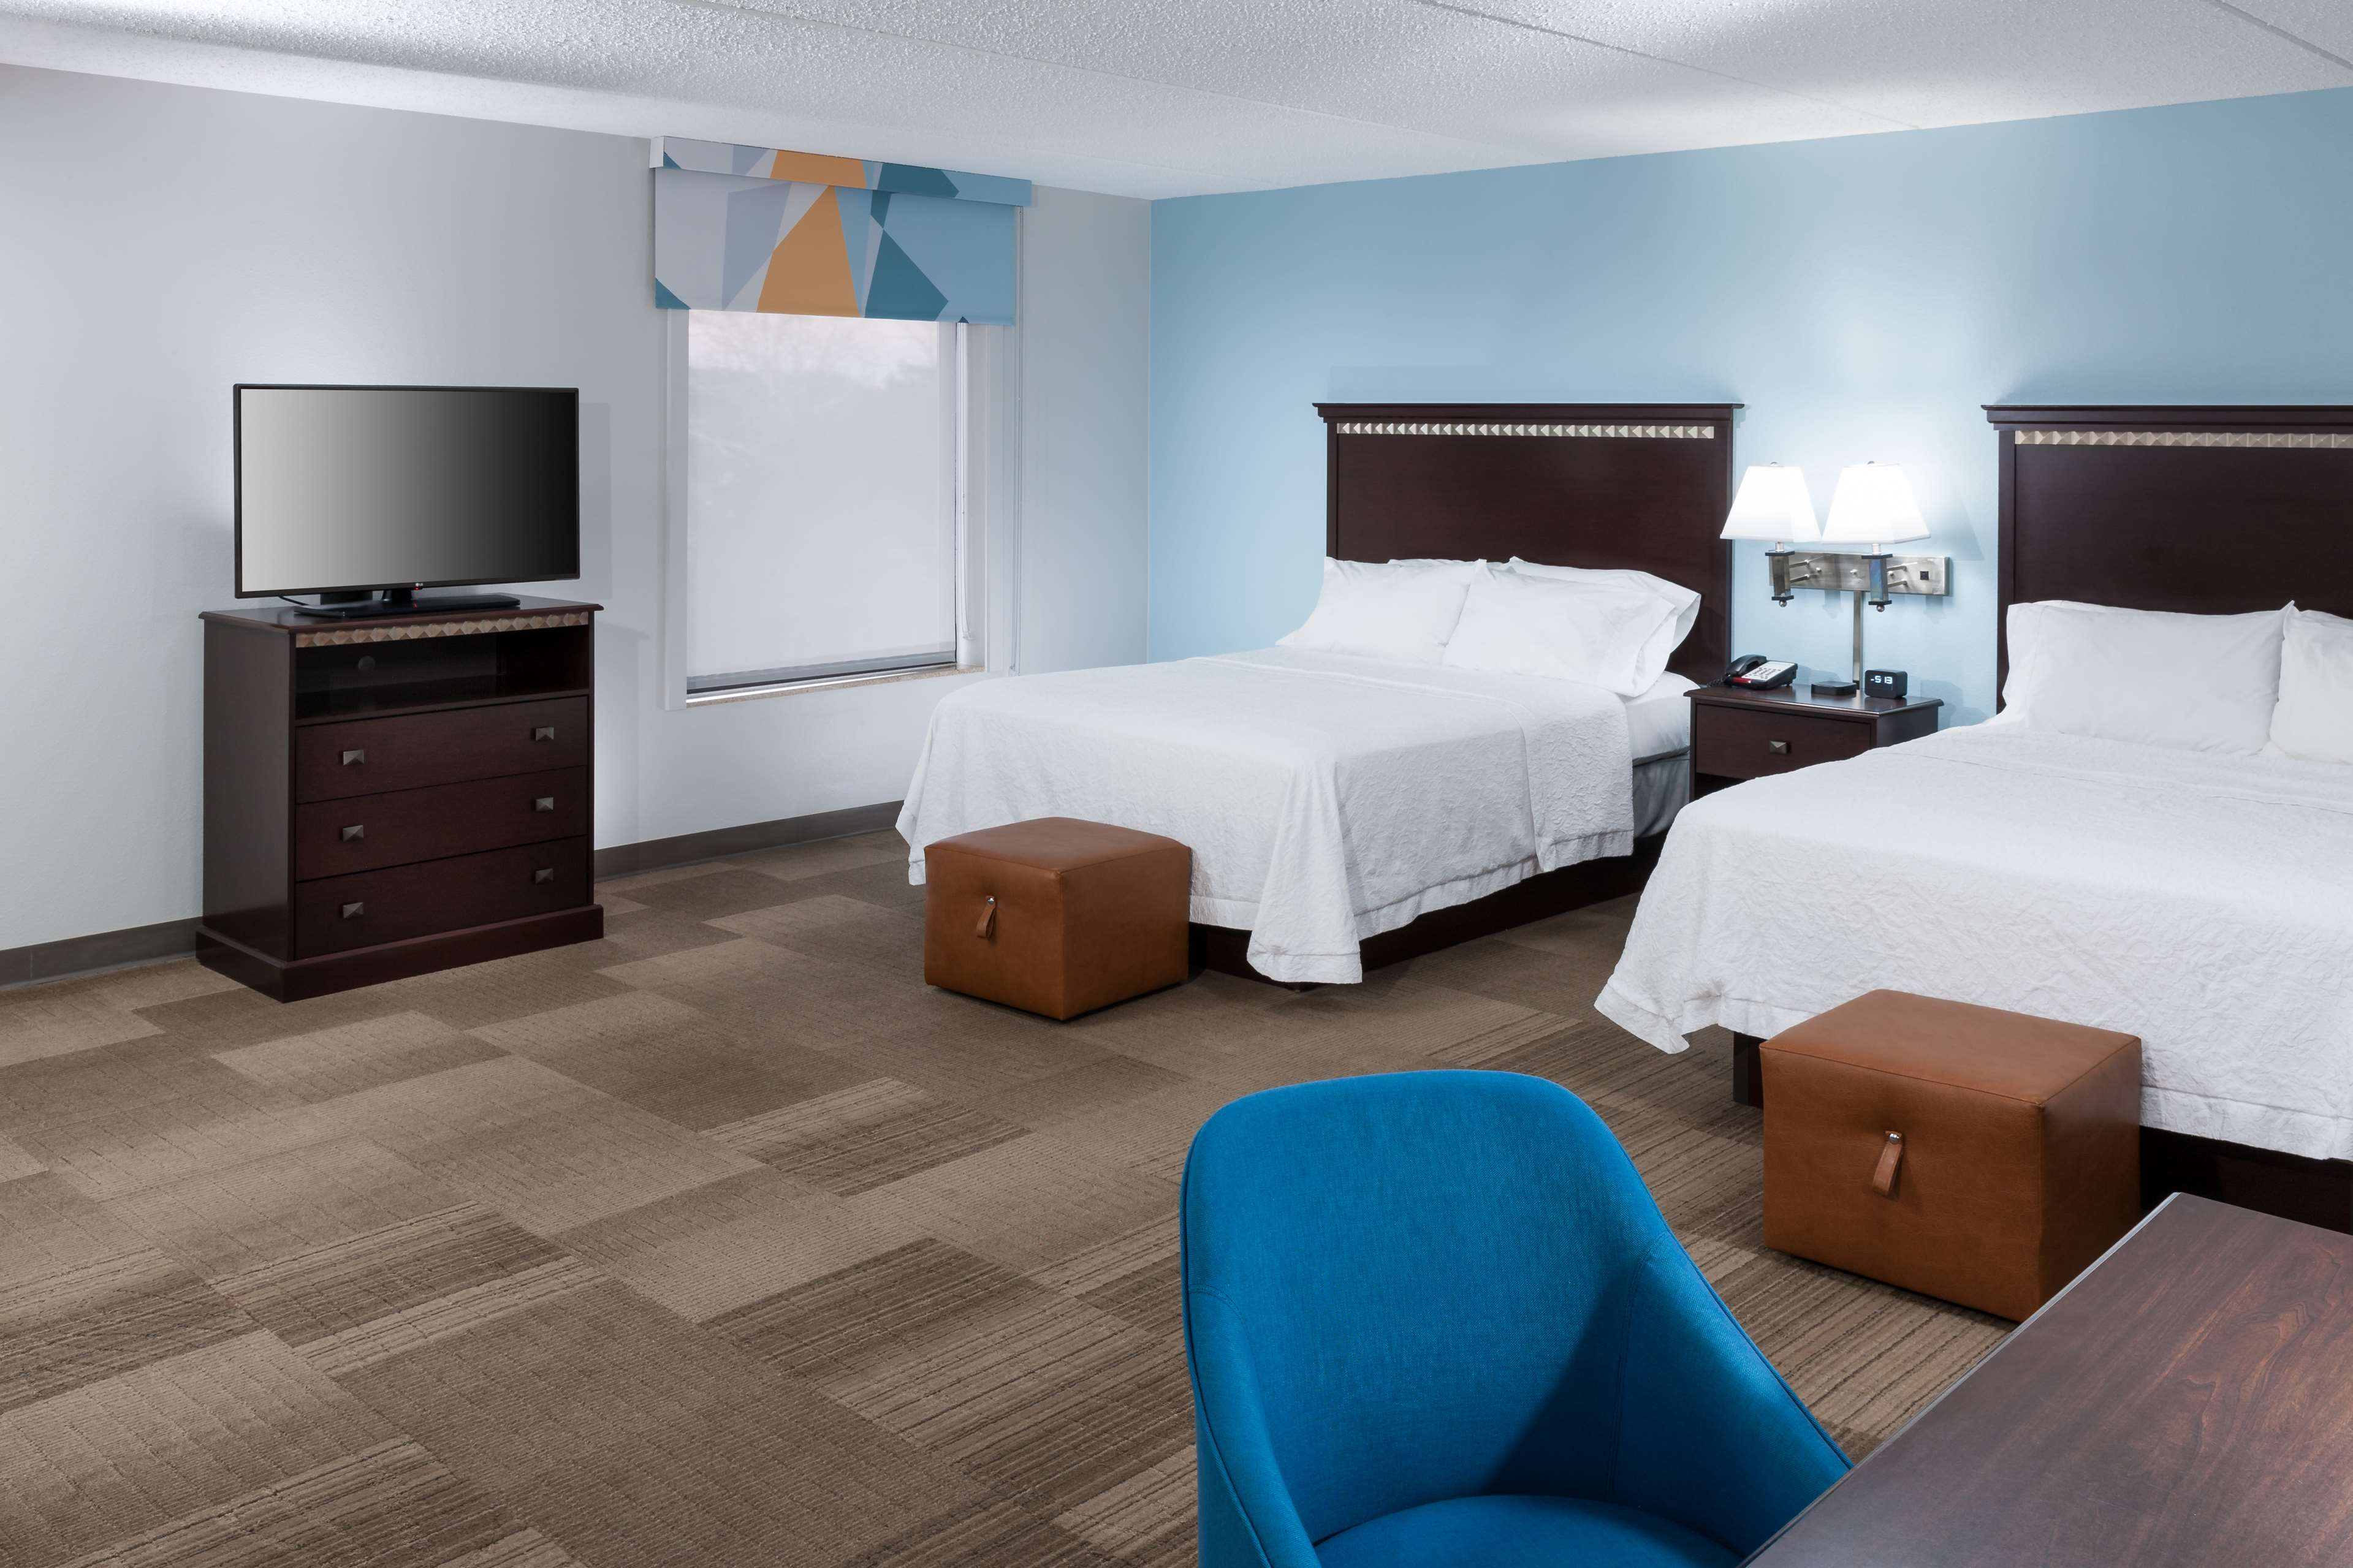 Hampton Inn & Suites Panama City Beach-Pier Park Area image 23